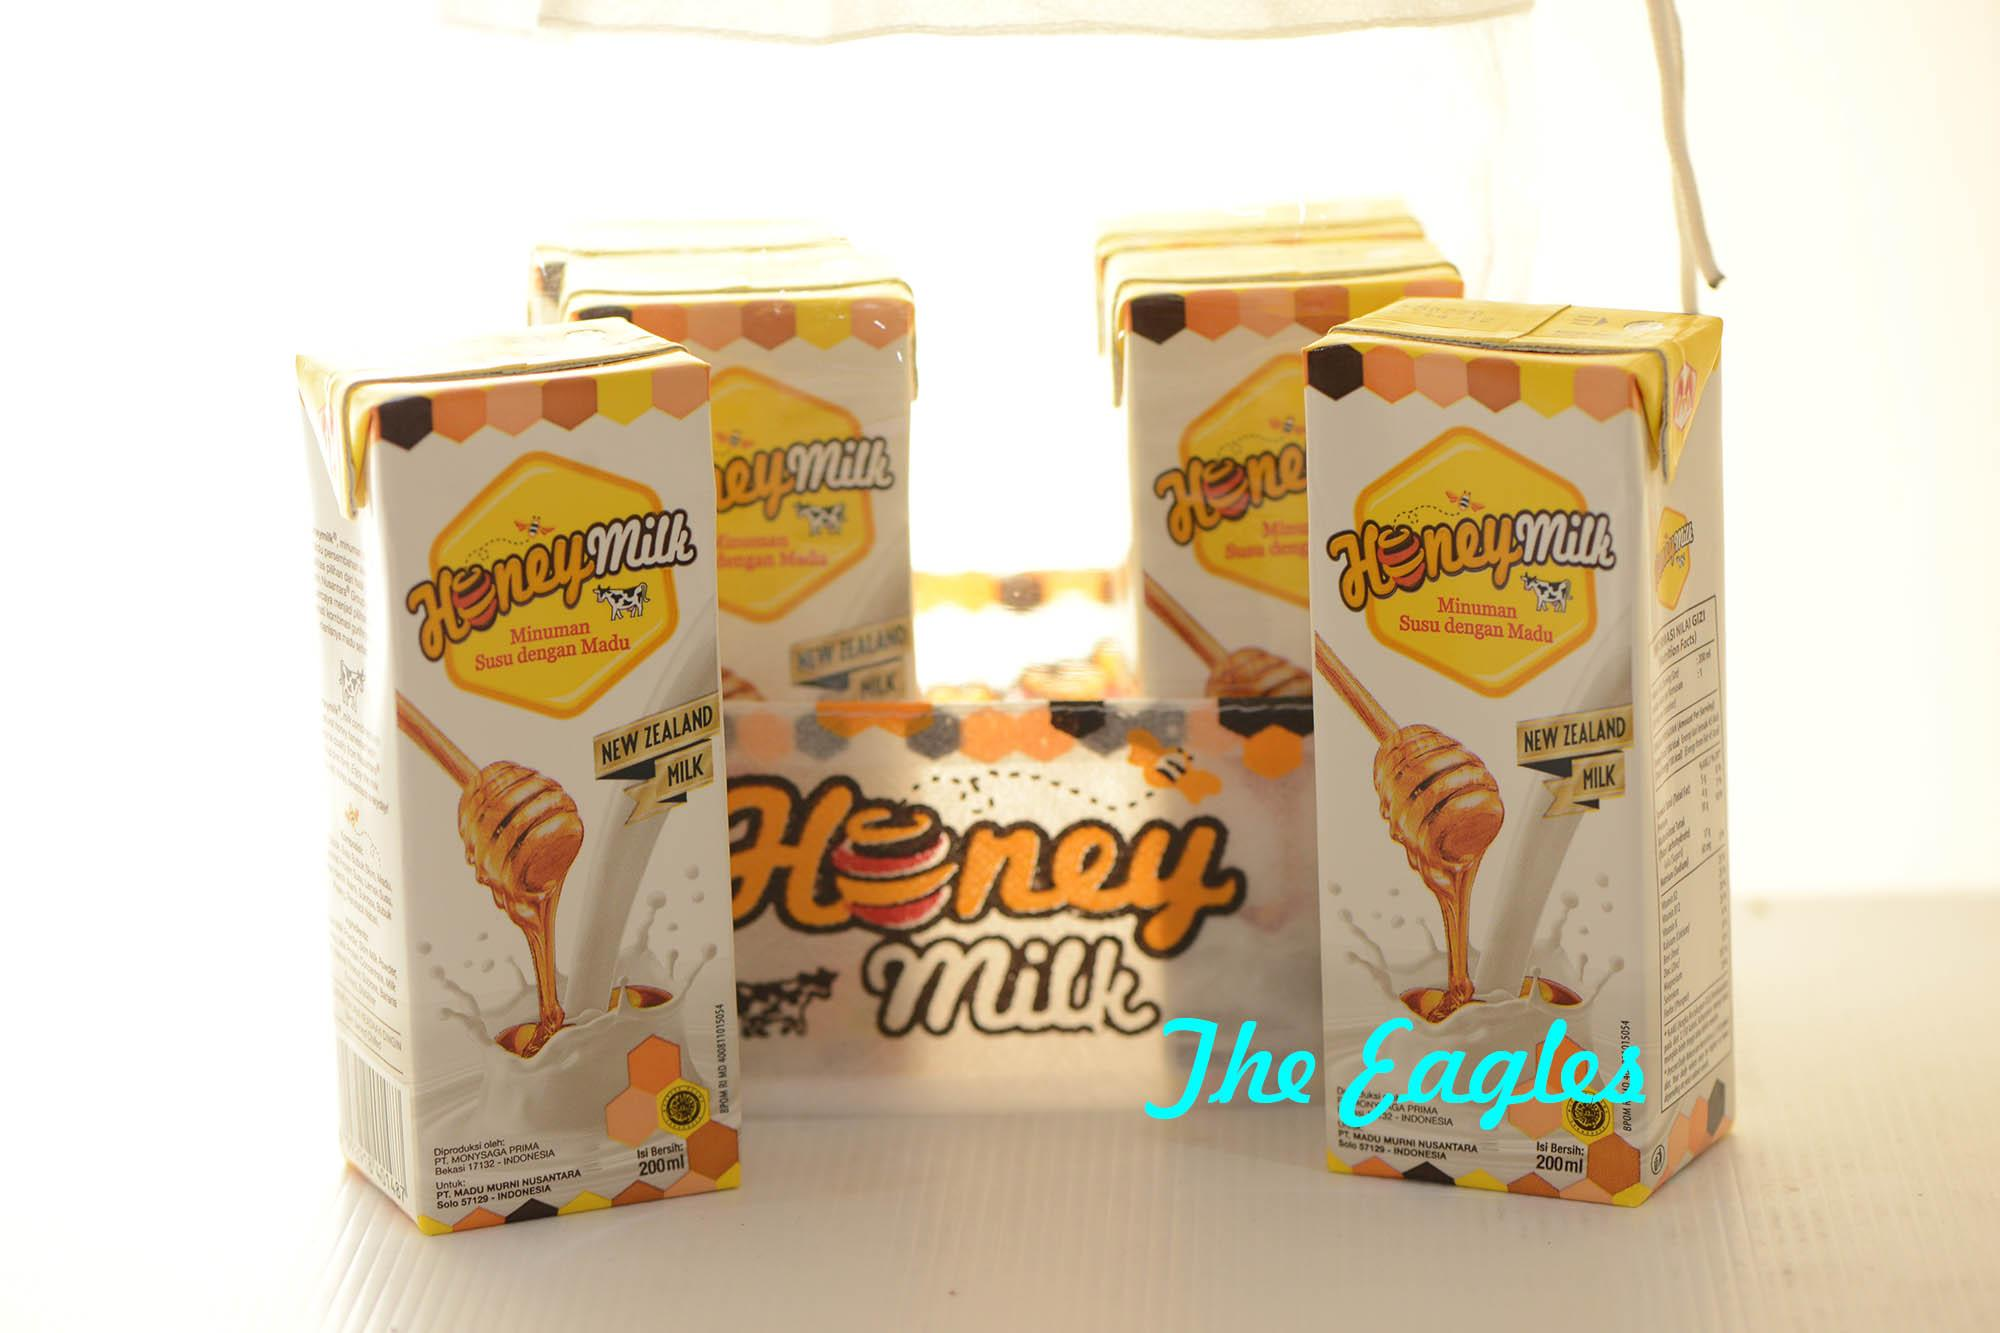 Daftar Harga Madu Murni Nusantara Promo 650ml Honey Milk Susu By 200ml X6 Alami Asli Minuman Sehat